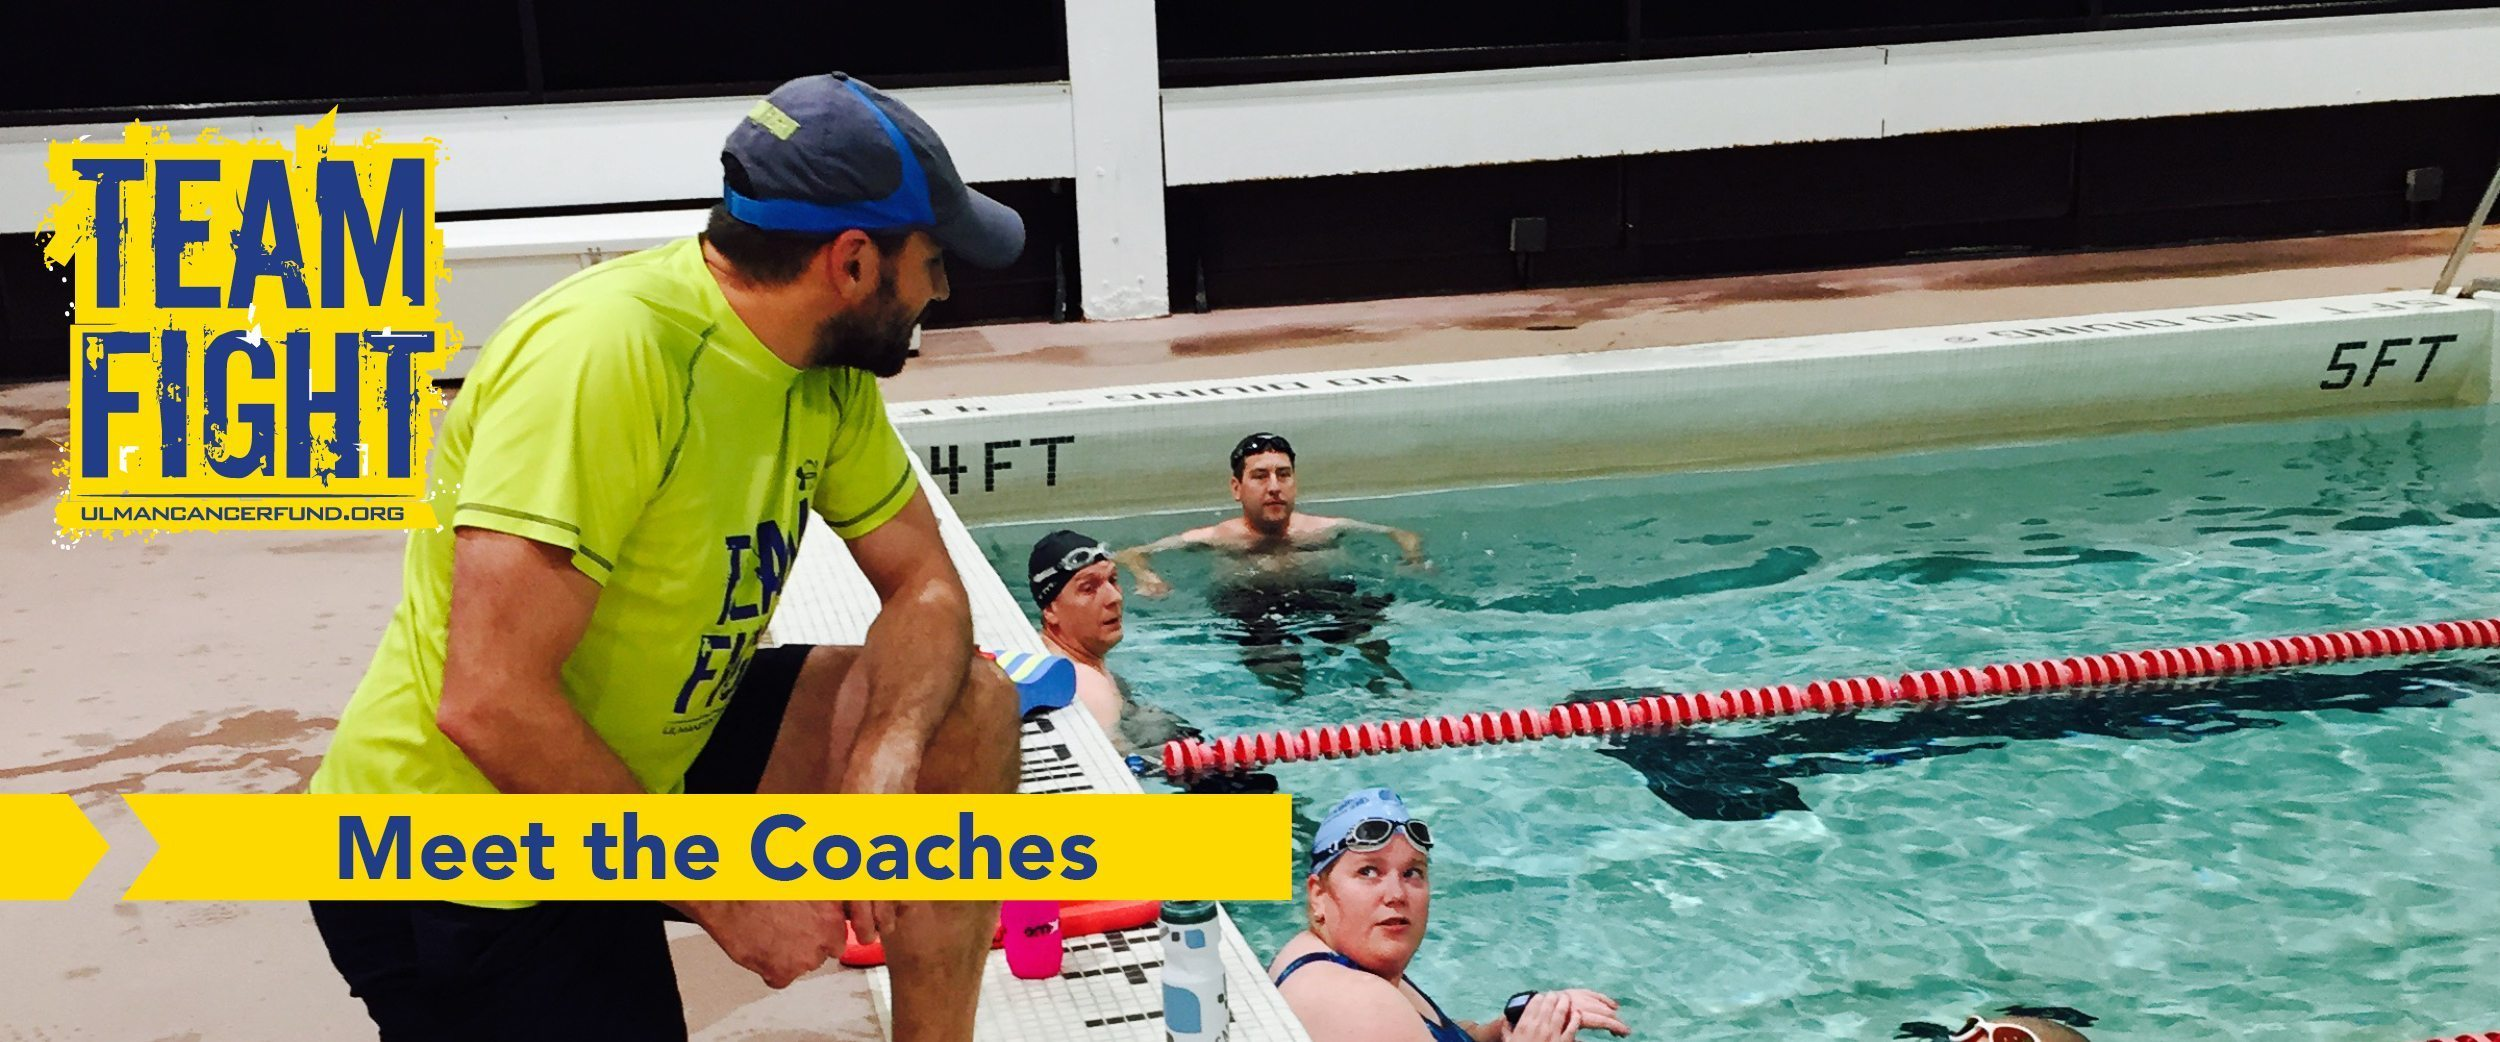 Teamfight_header_Coaches (1)